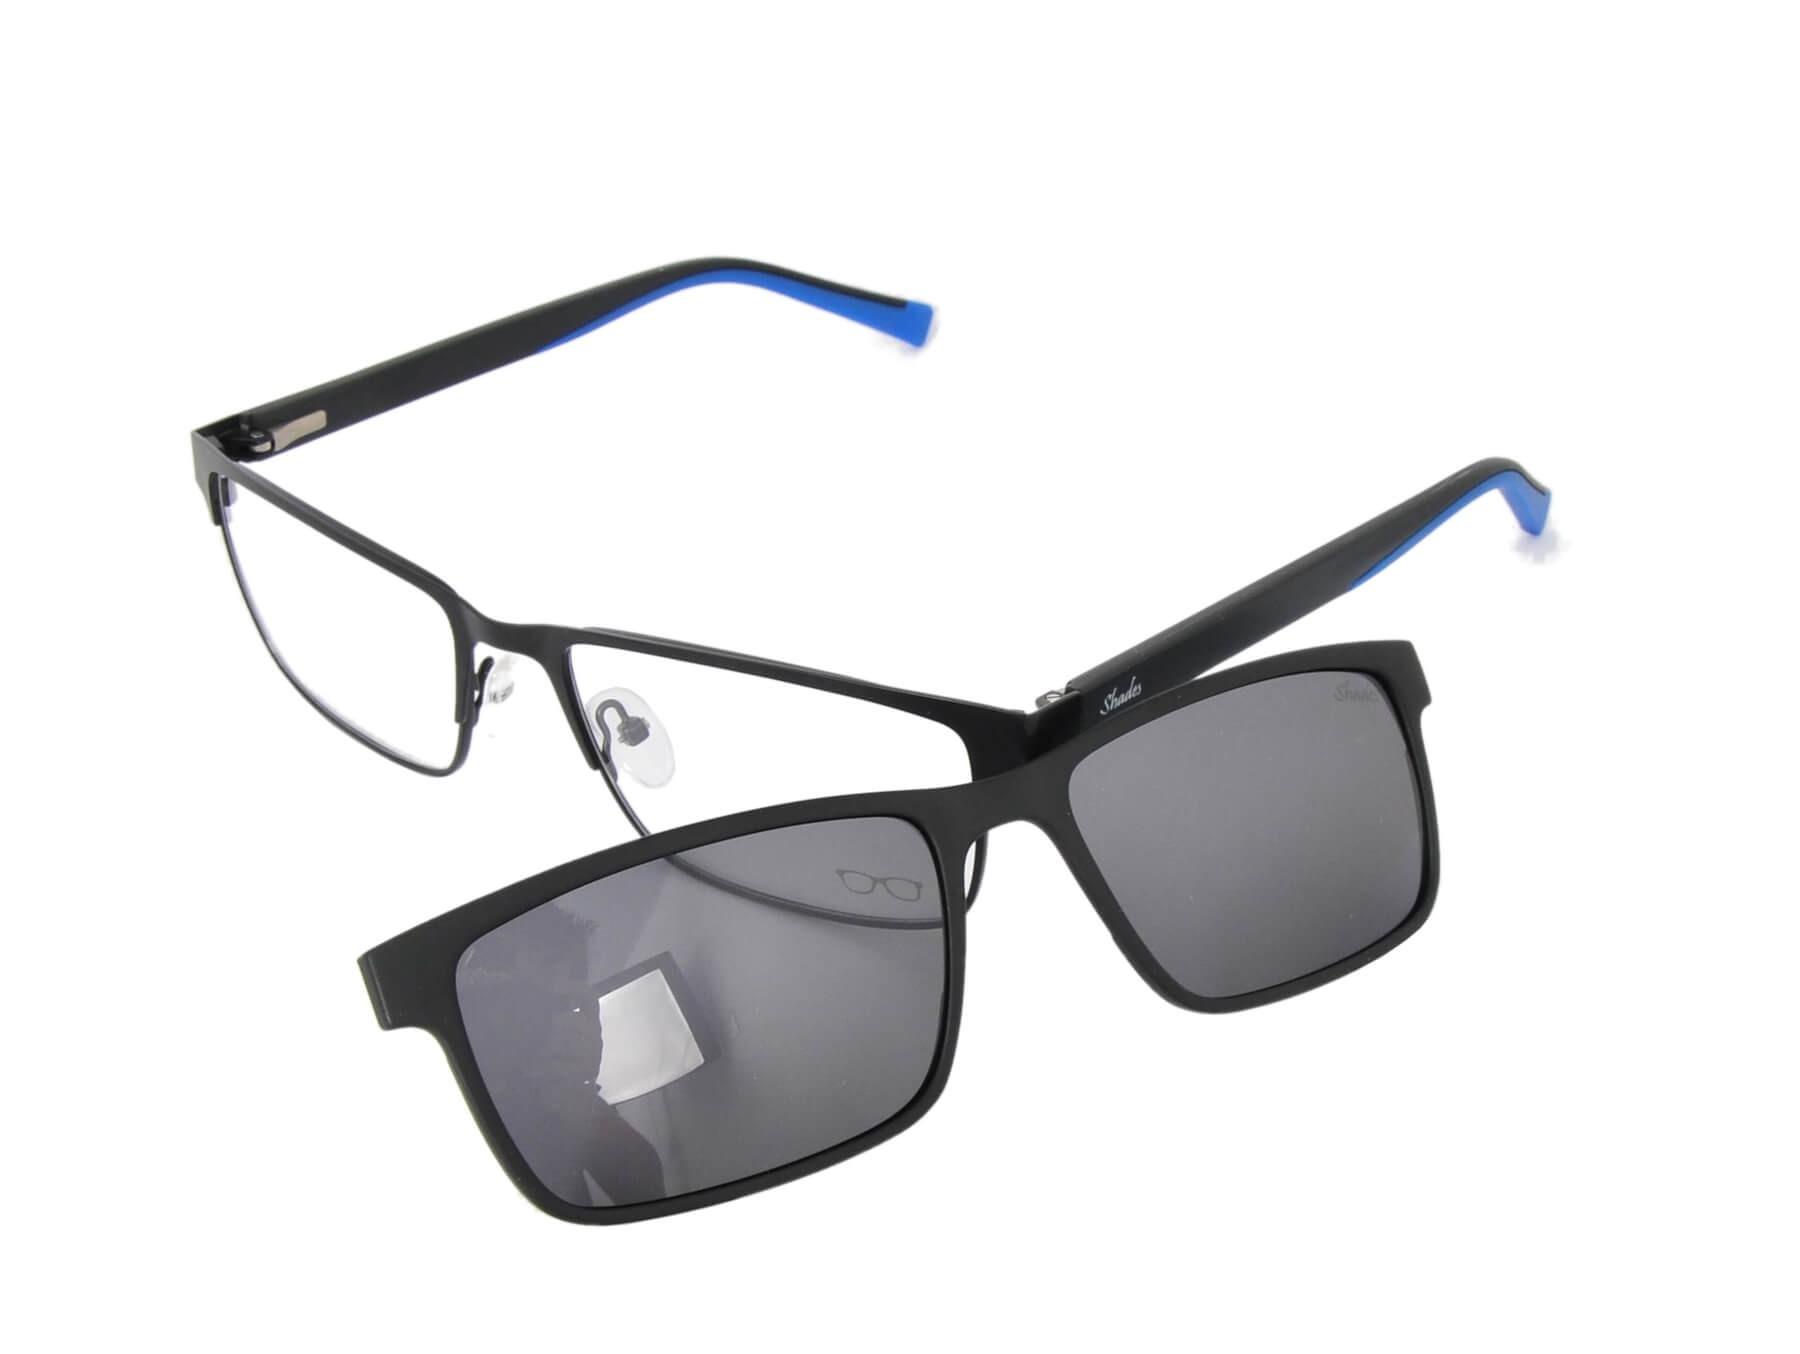 Oculos masculino com Clip on solar